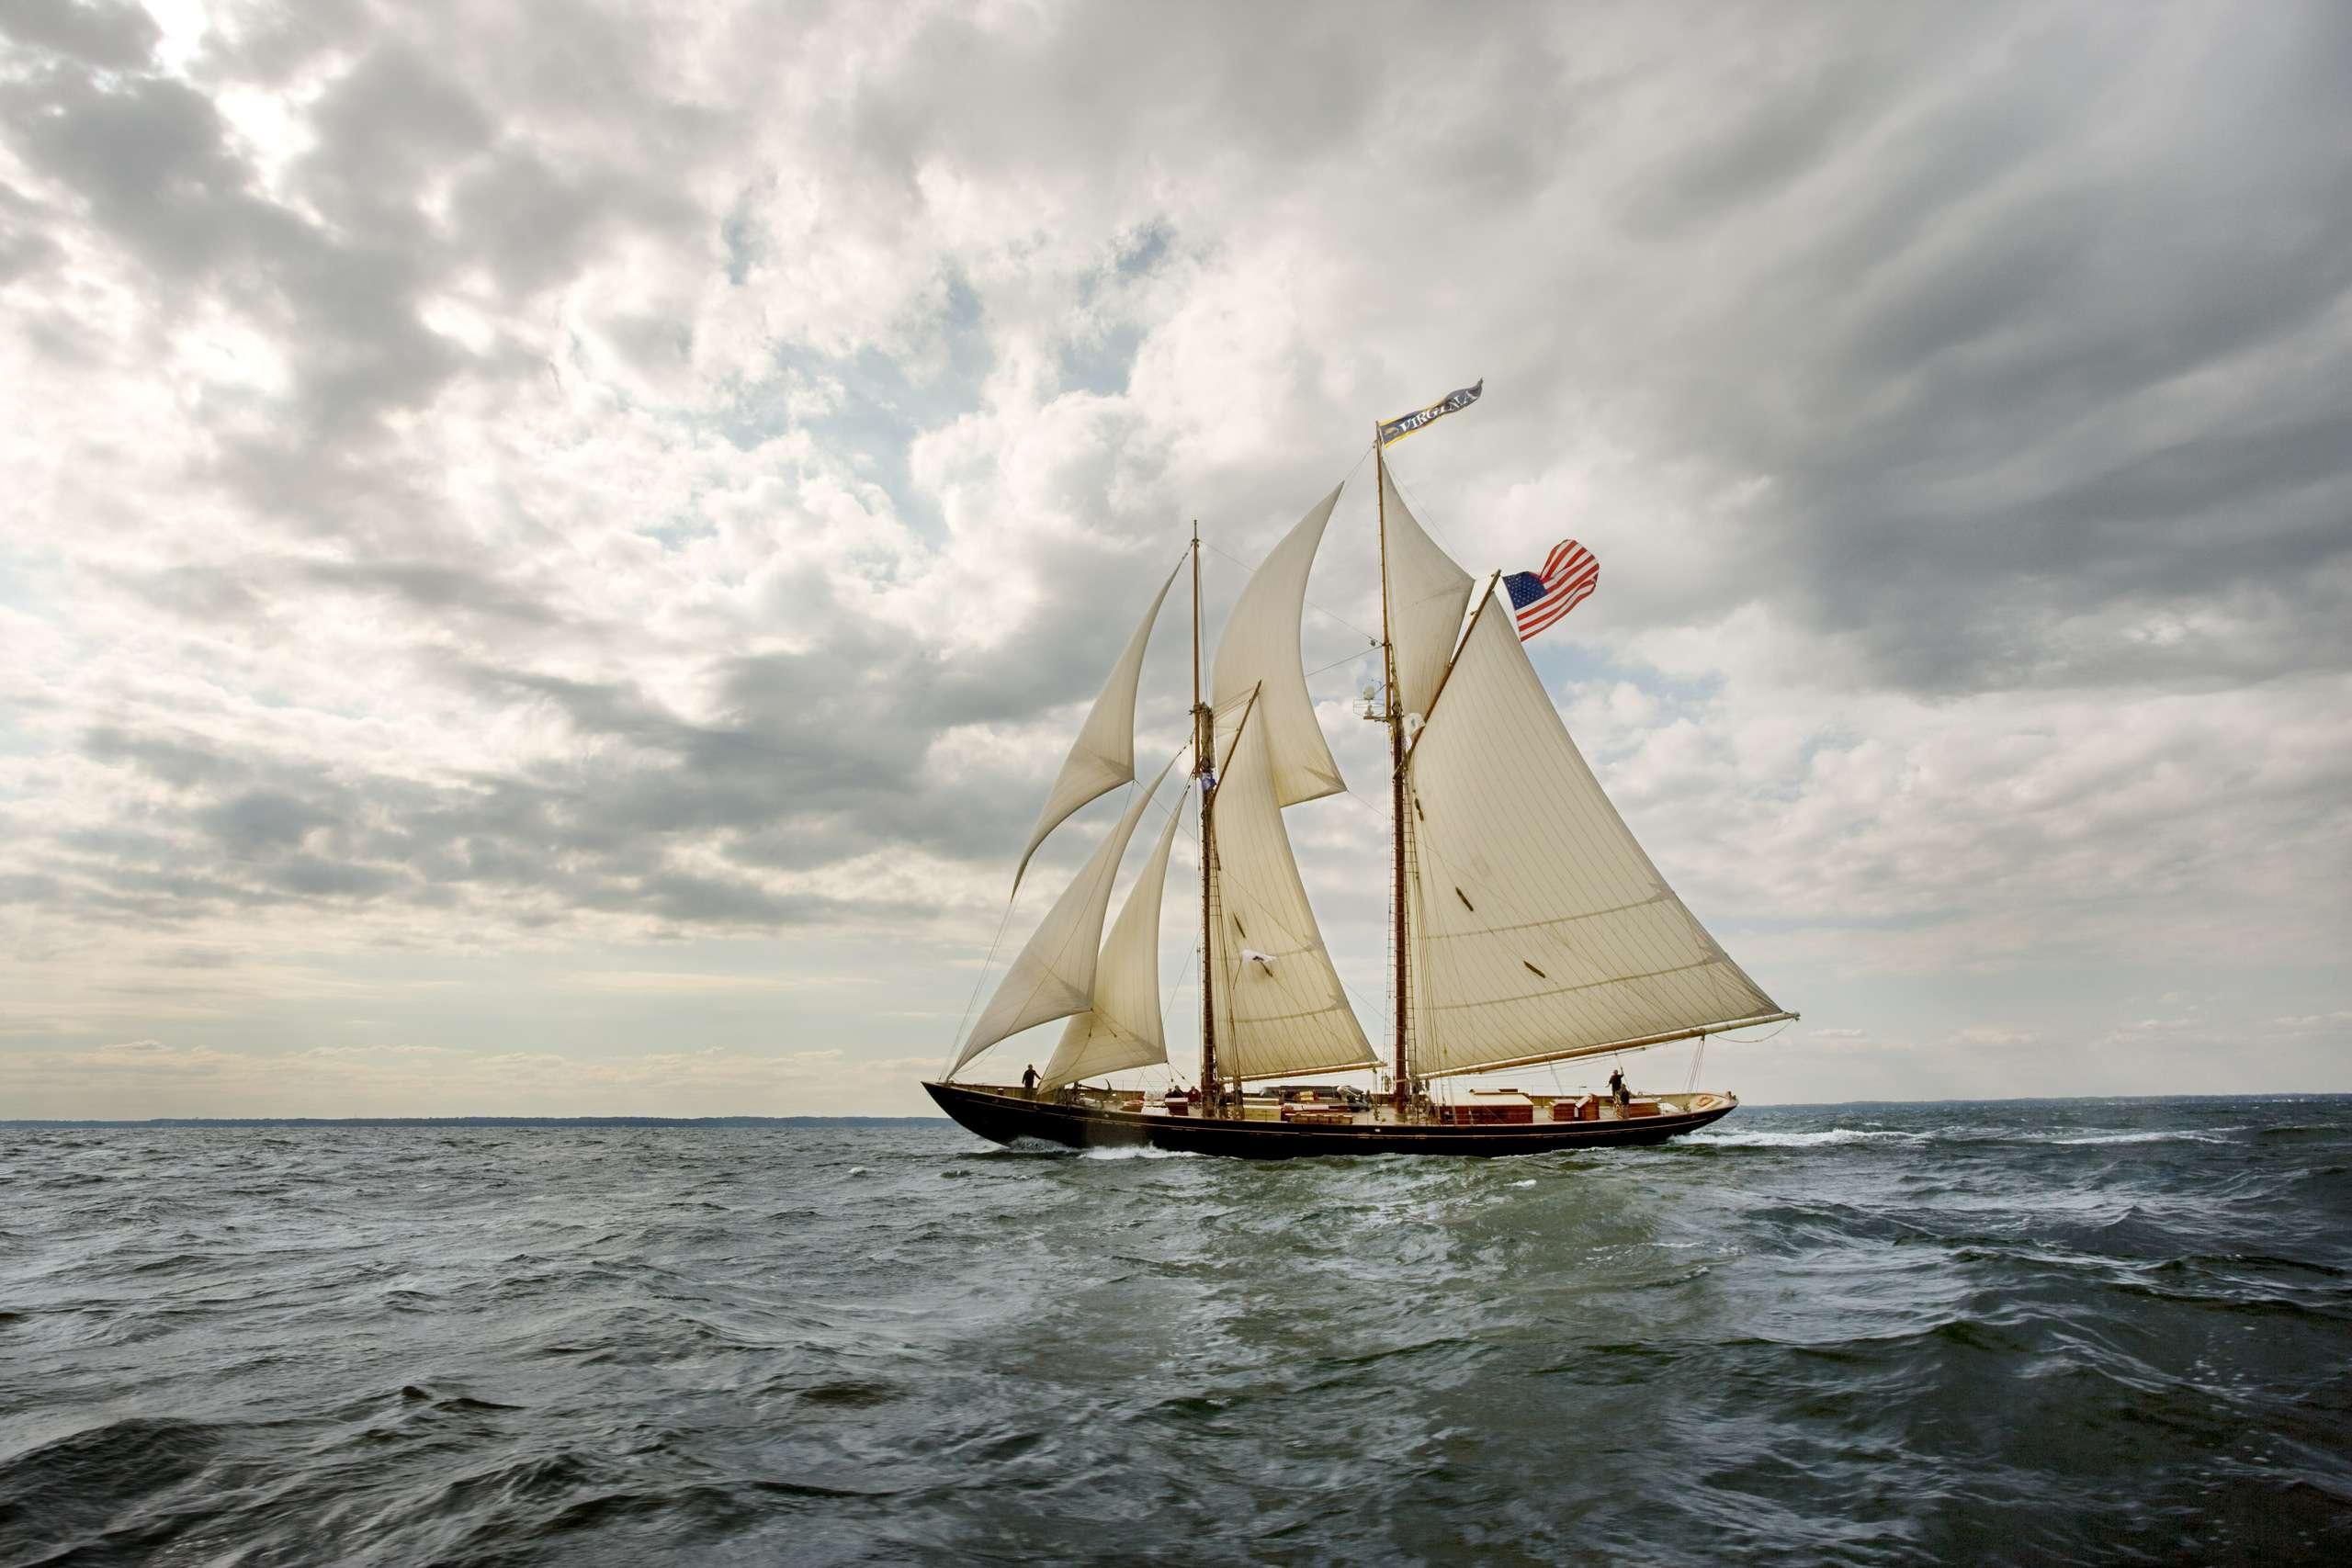 PORTFOLIO - Sailing - Tall Ships #11-PCG271